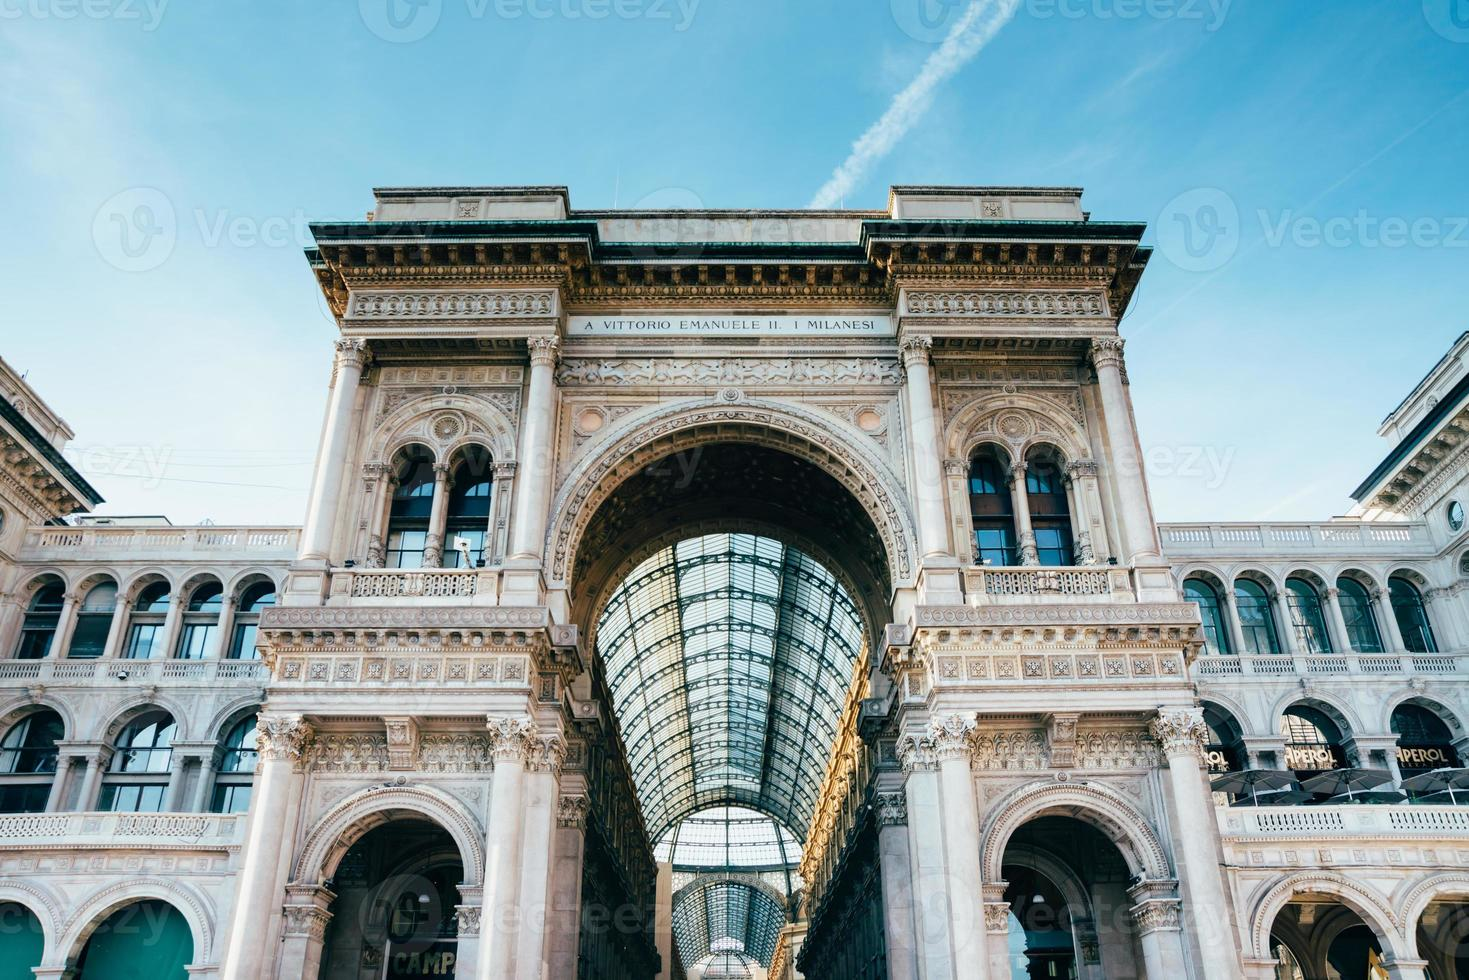 galeria de vittorio emanuele ii na piazza del duomo, em Milão. foto